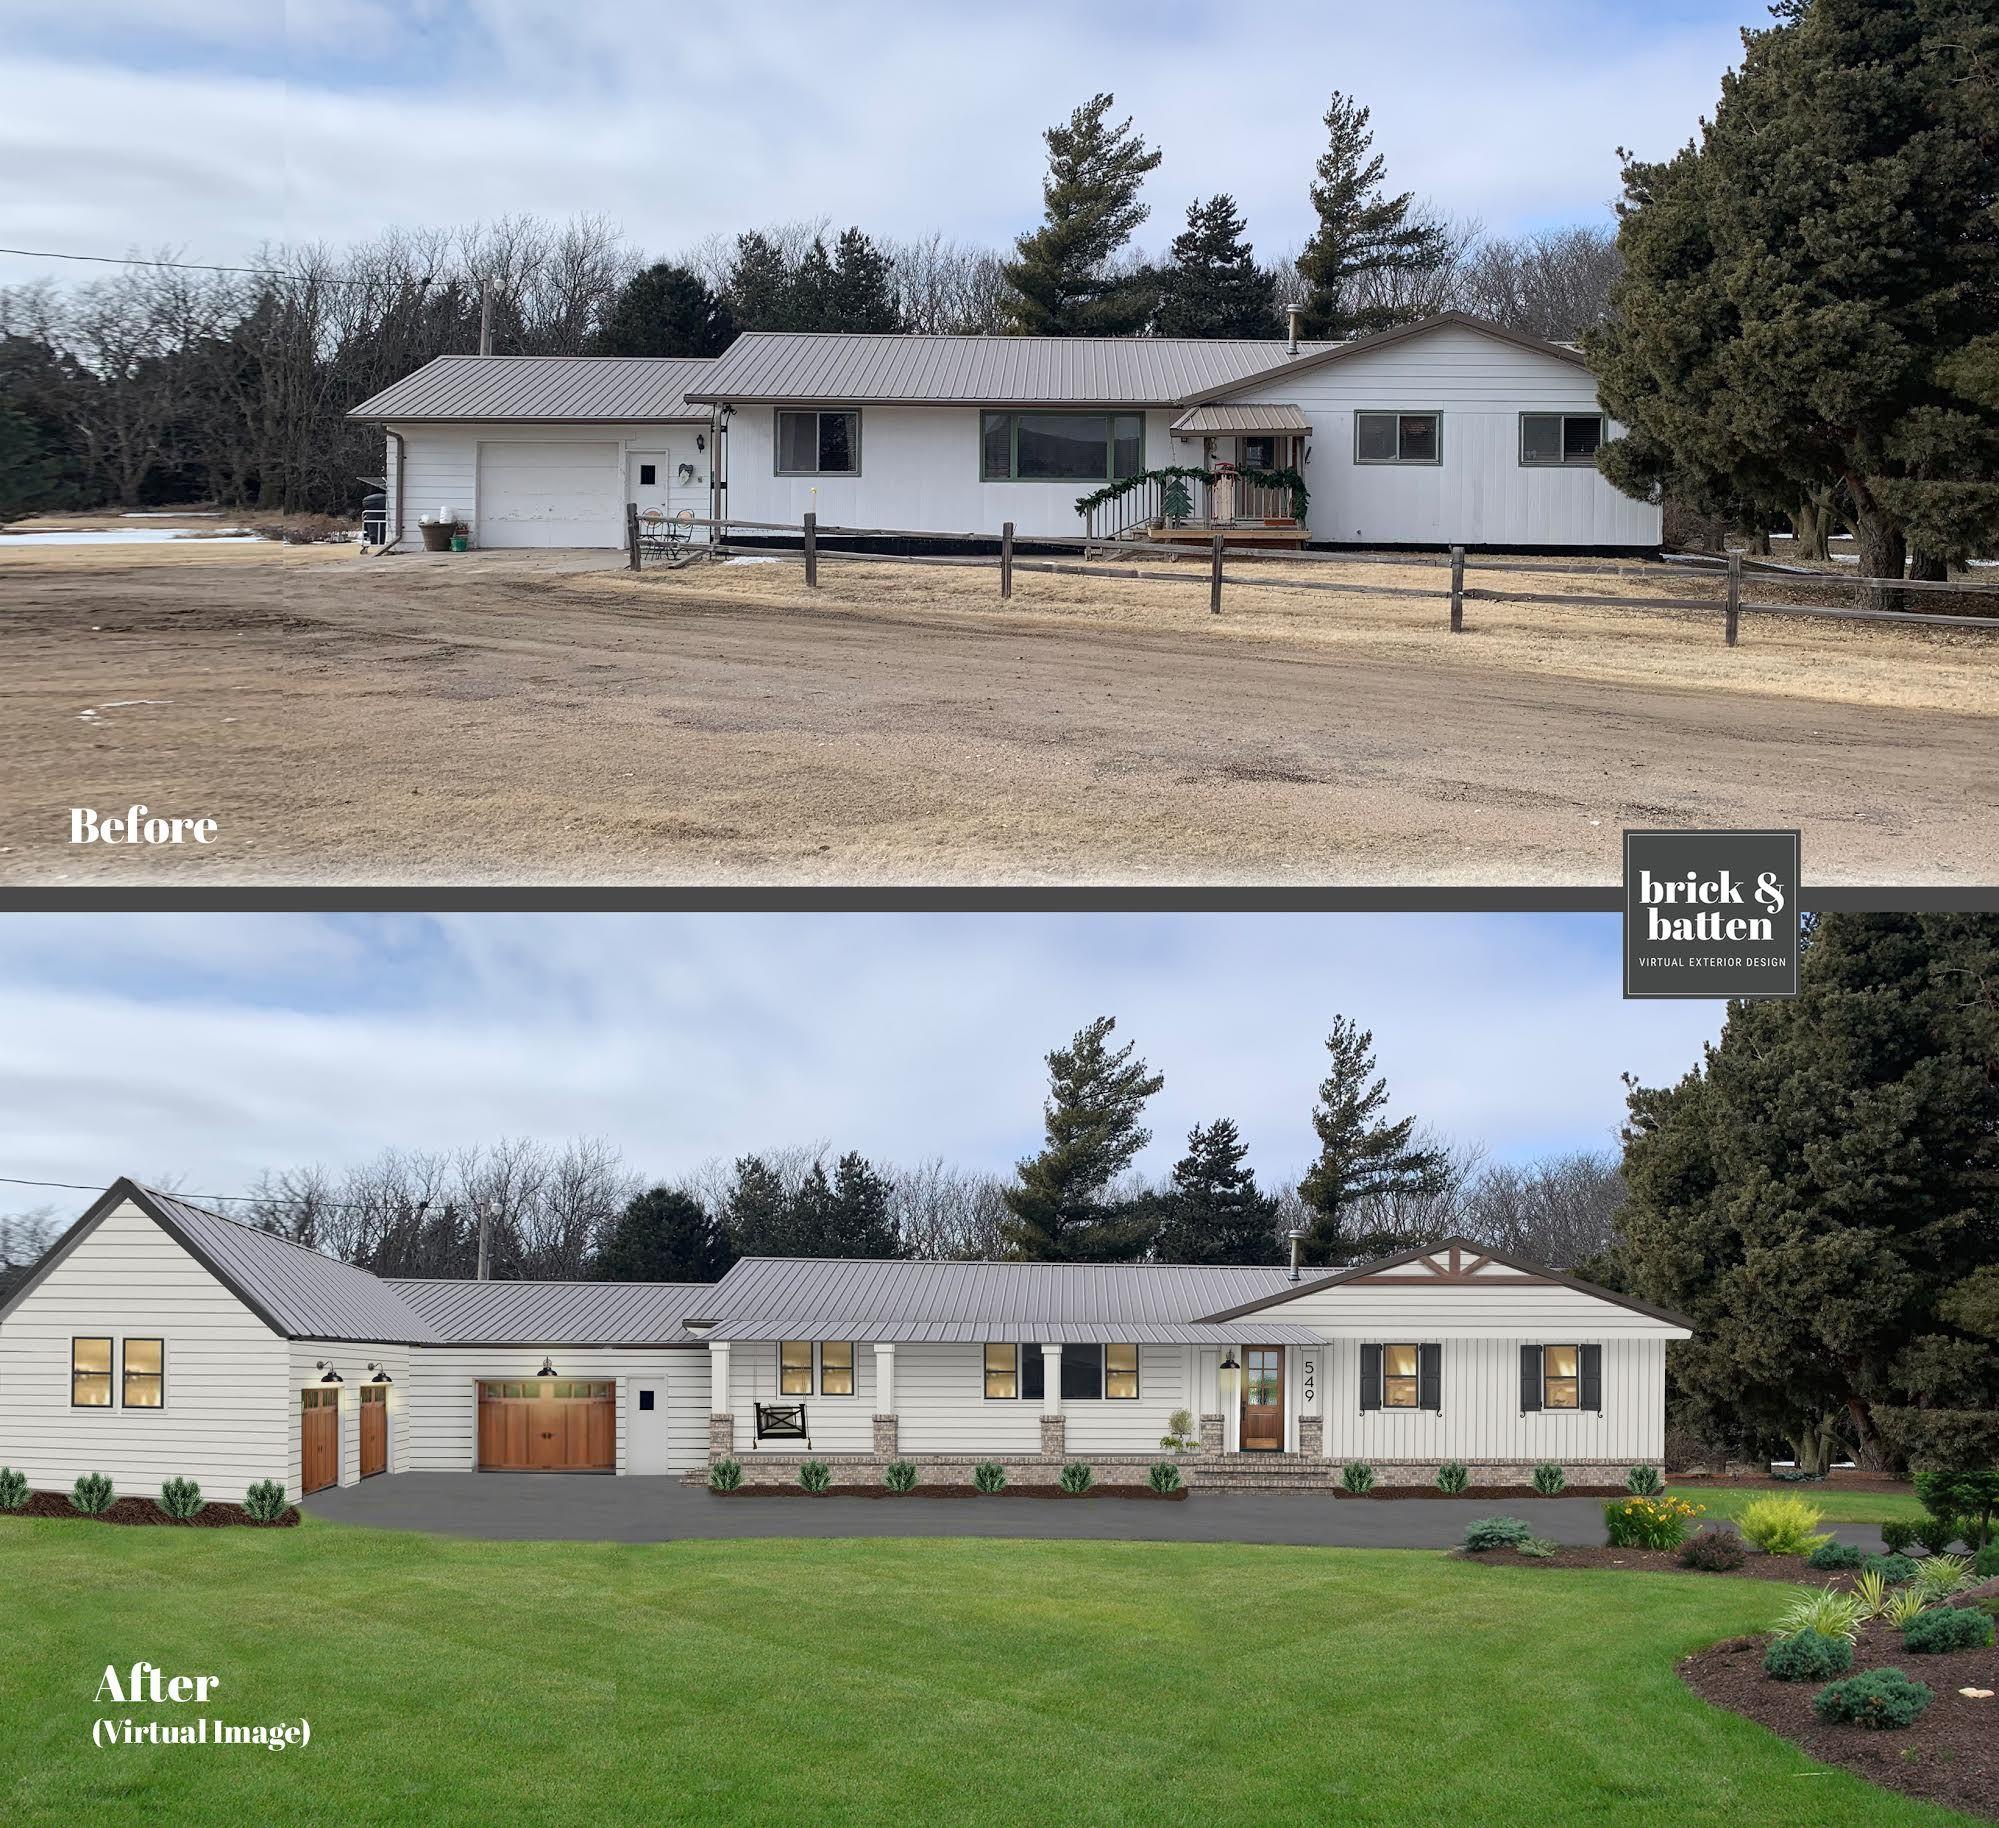 12 Tips For Home Exterior Design In 2019 Blog Brick Batten House Exterior Ranch House Exterior Exterior Design